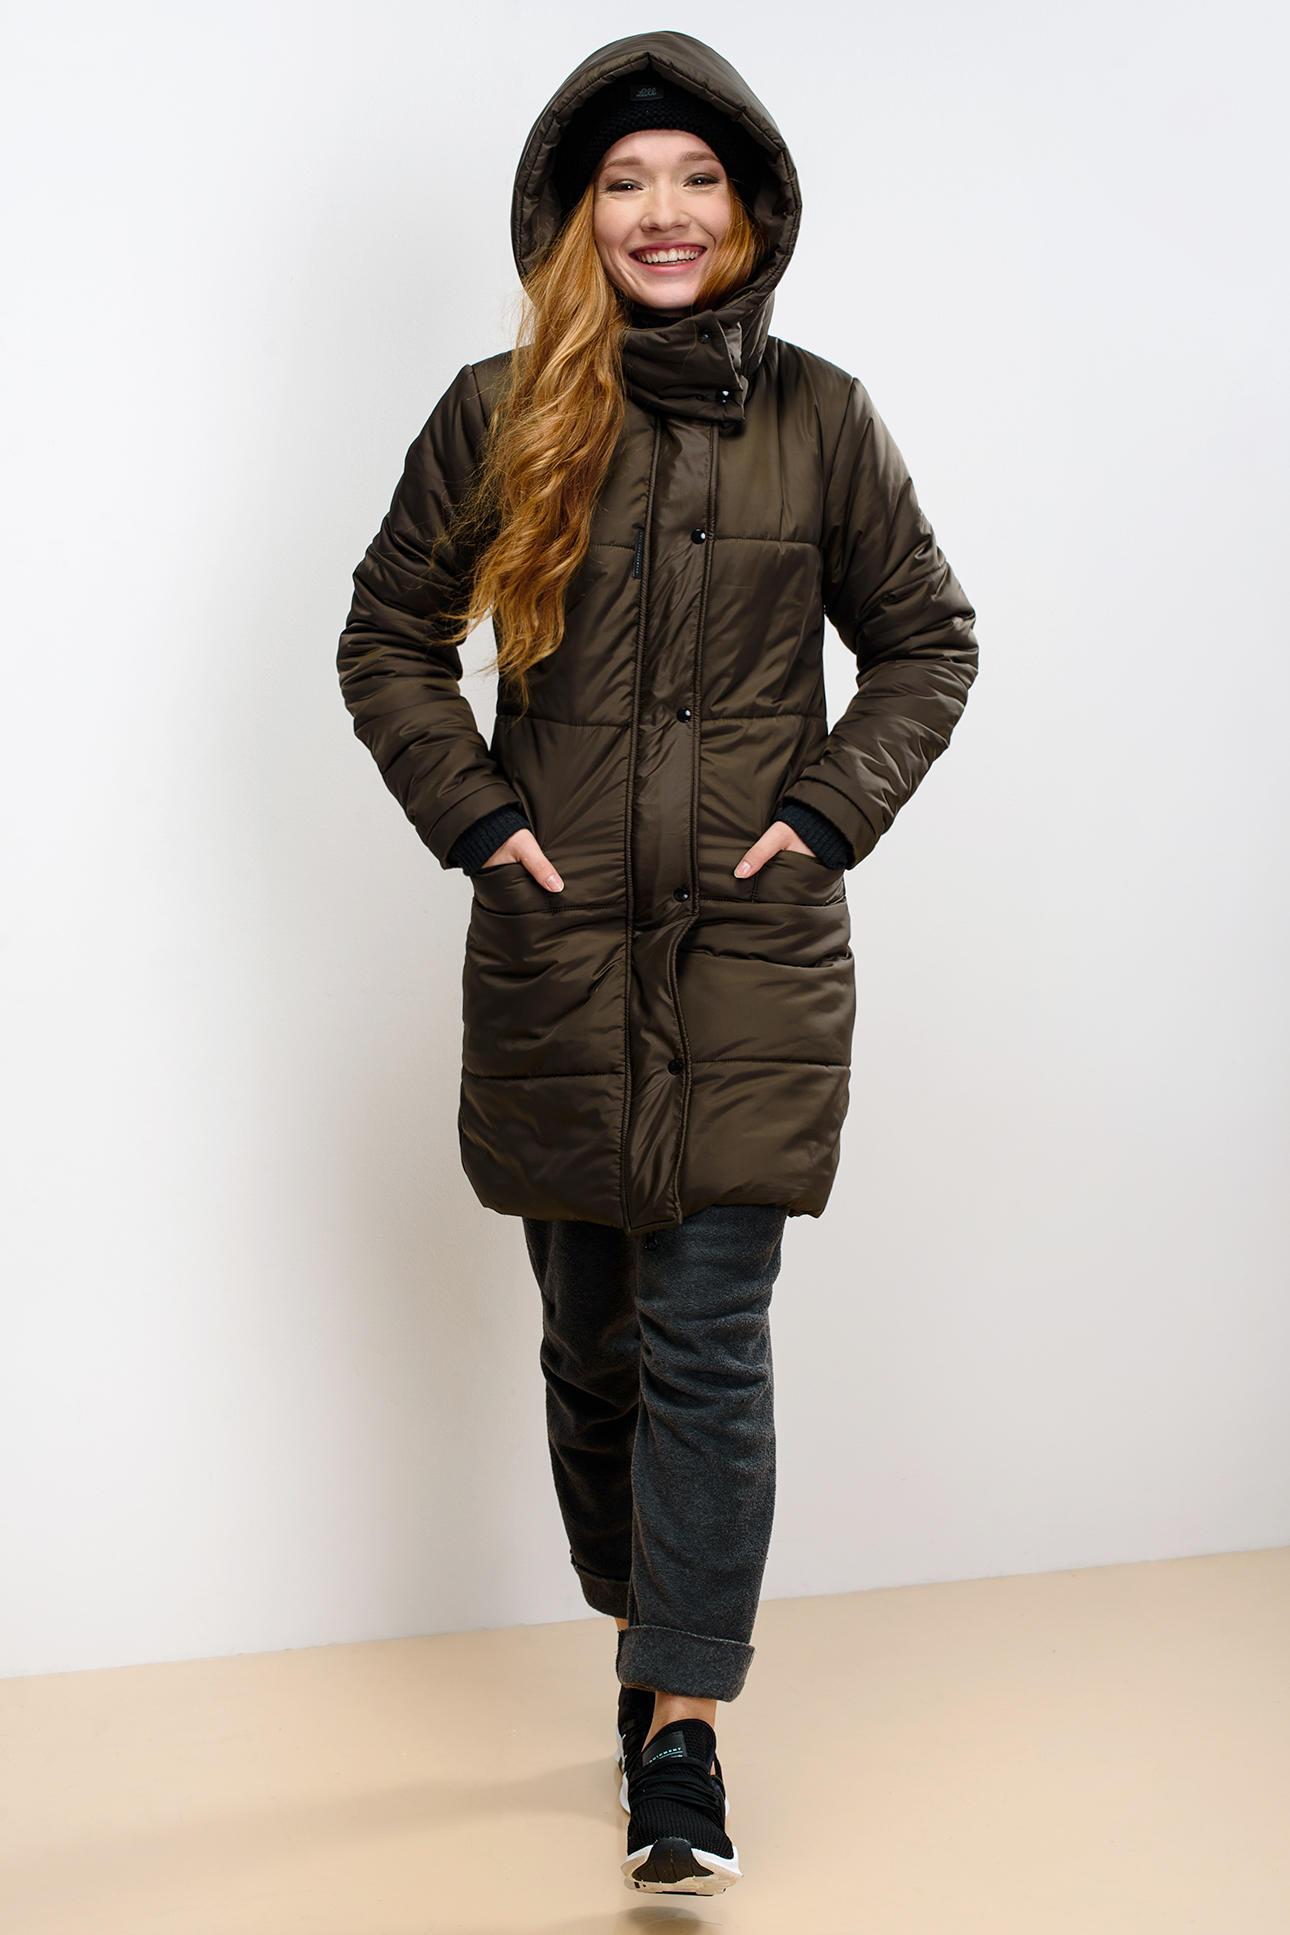 Zimná Bunda Tops - Lull.sk c68d1cfd556